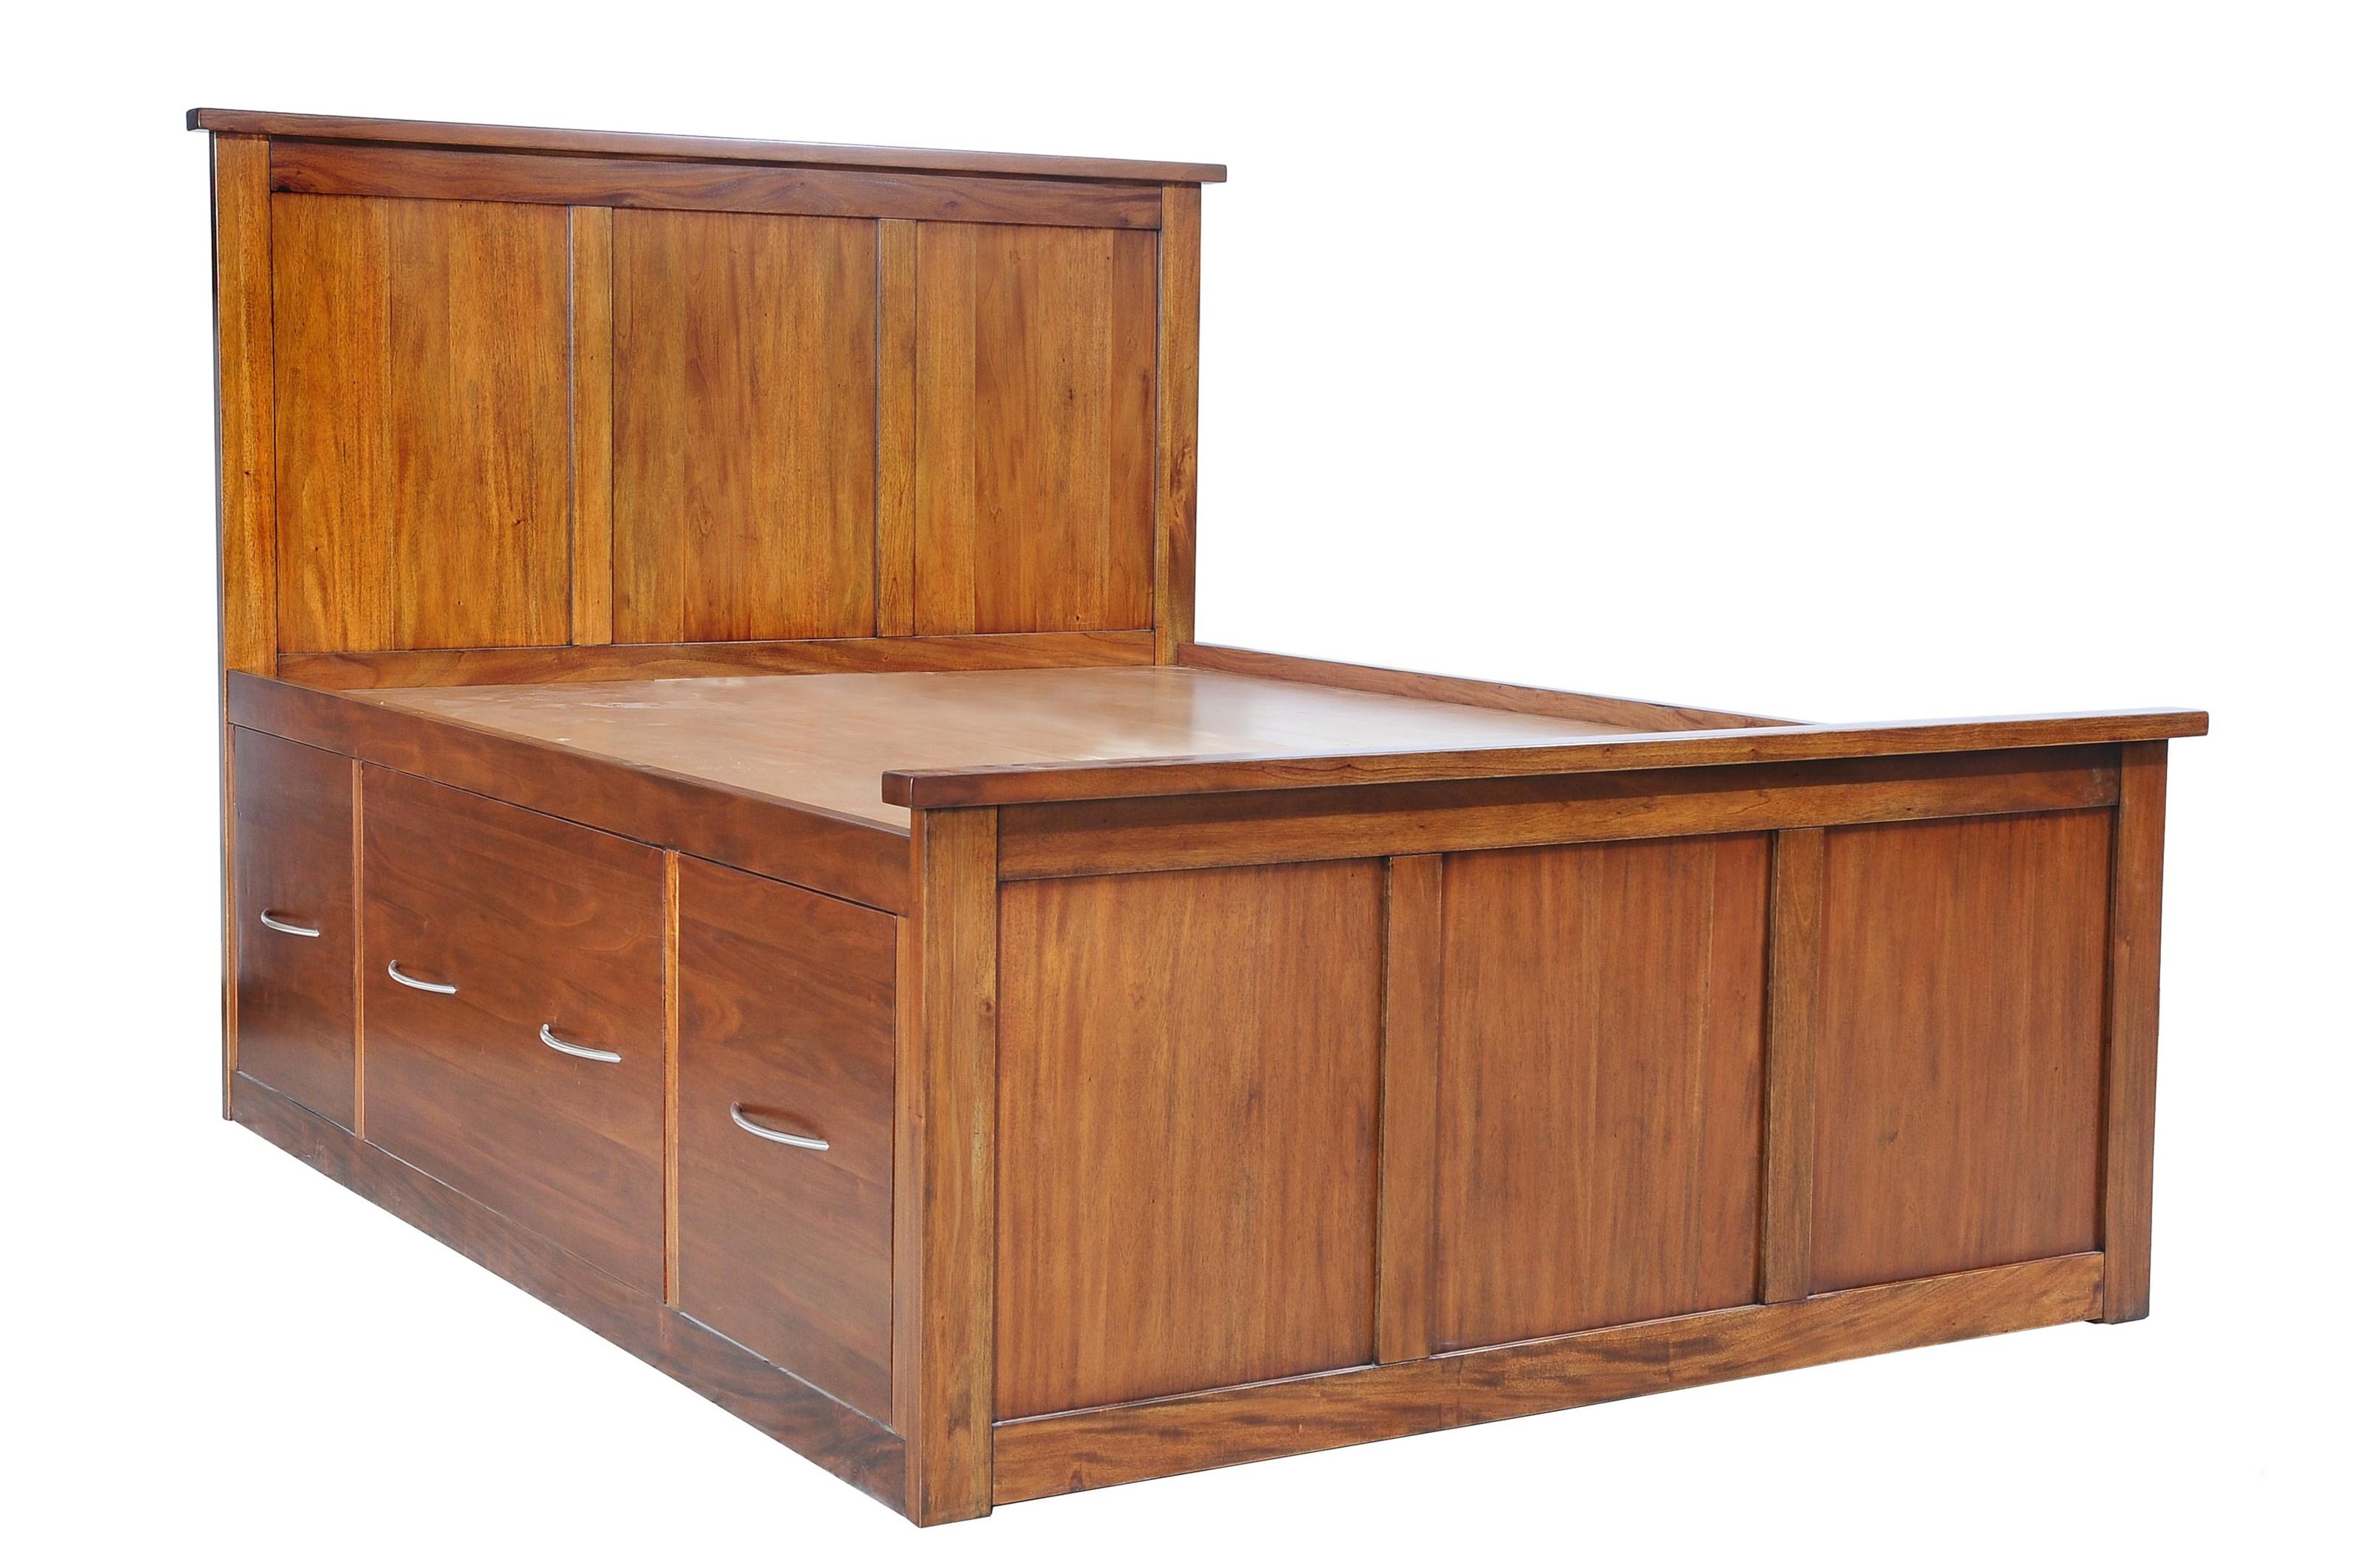 Napa Furniture Designs Boston Brownstone 9 Drawer Queen Bed - Item Number: Boston